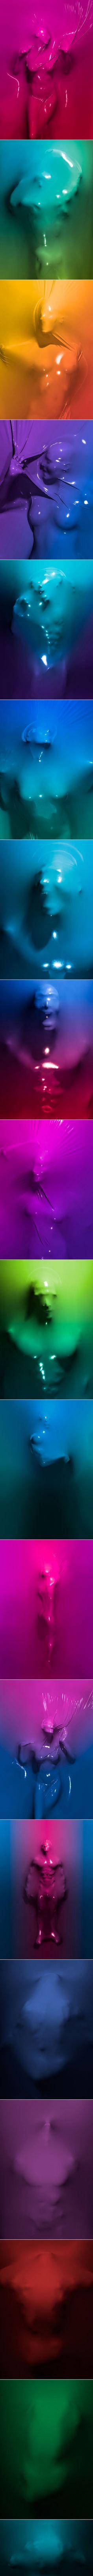 best wip images on pinterest contemporary art art